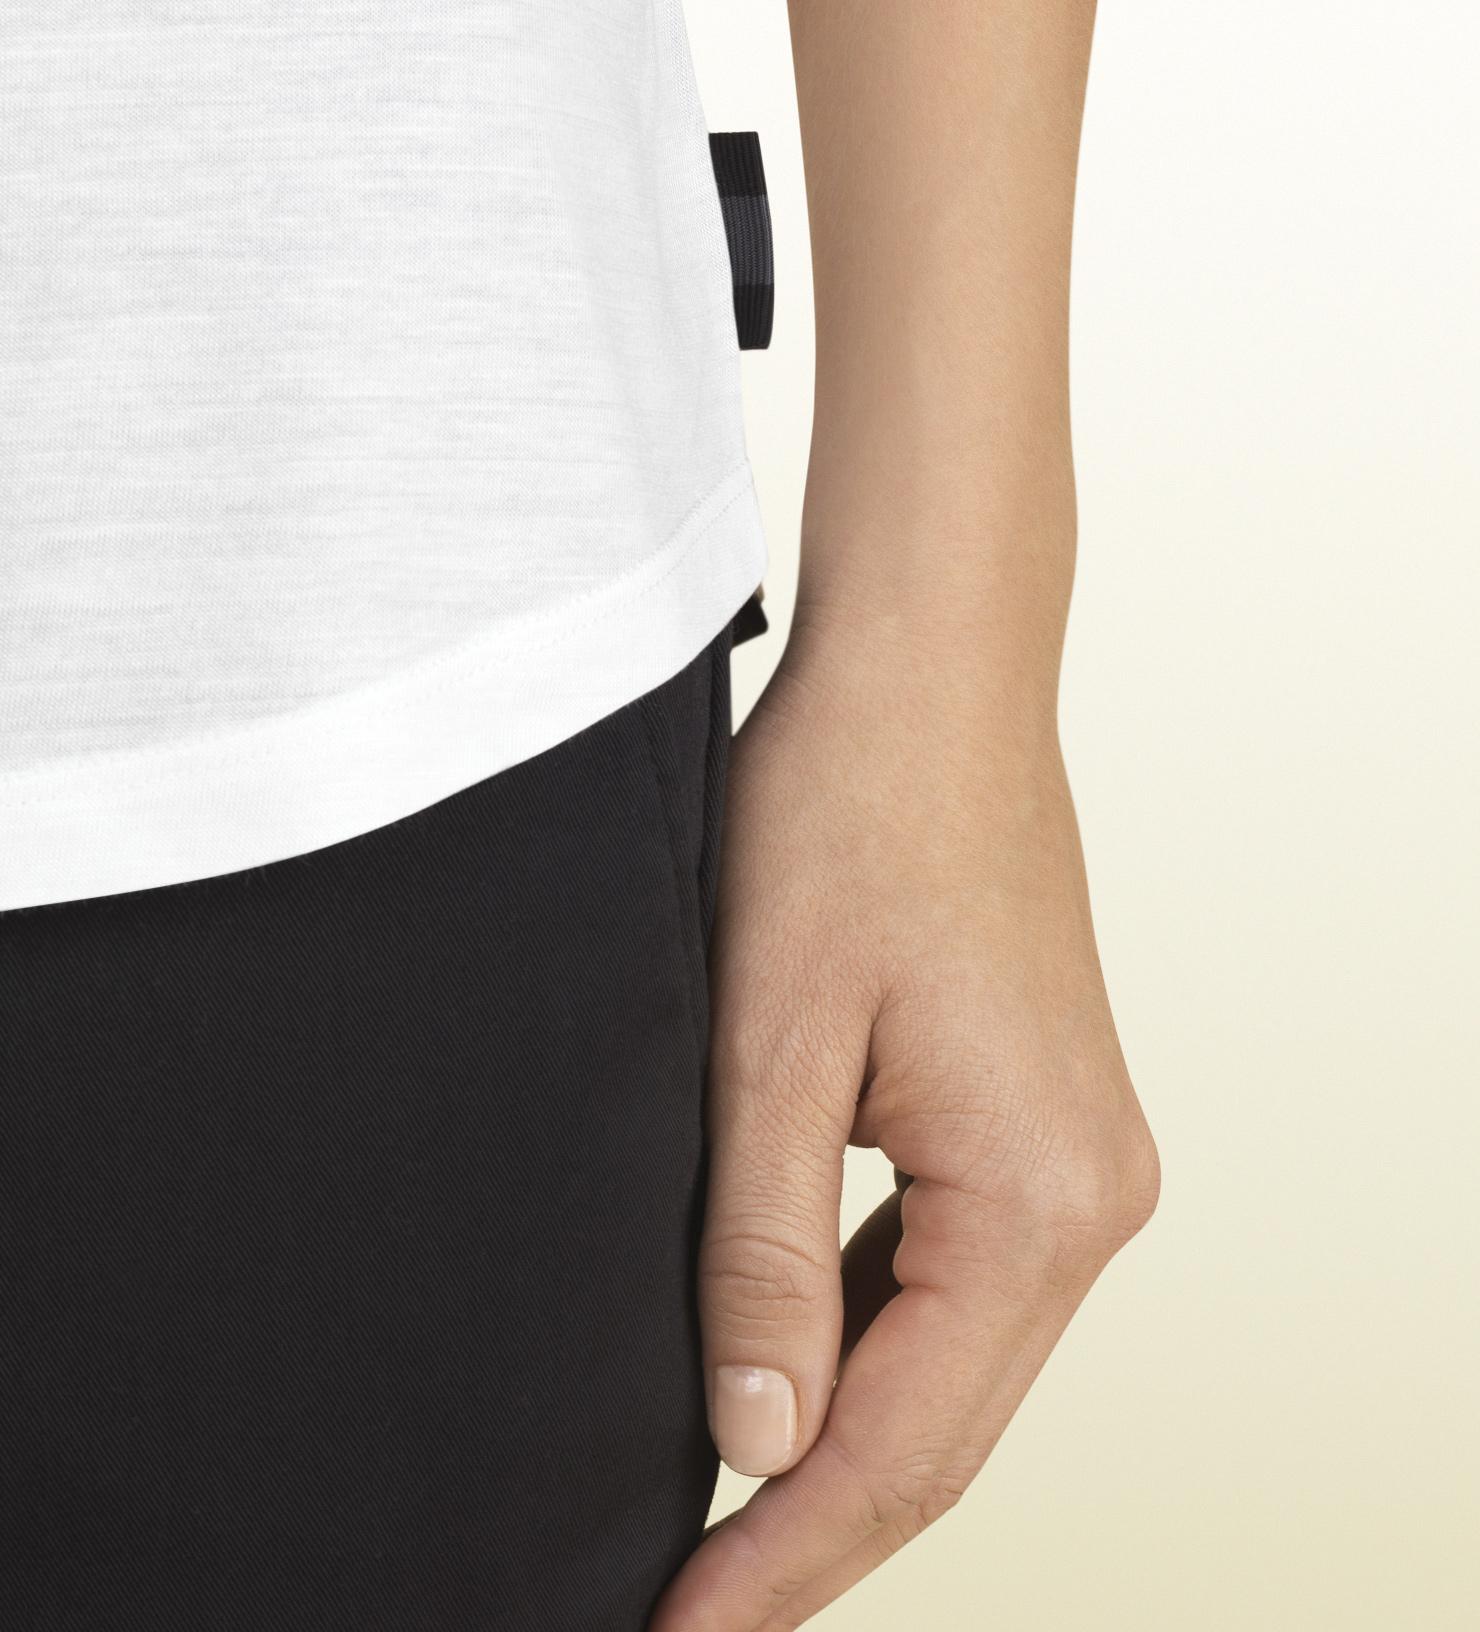 0ad577e0 Gucci Women's White Silk Jersey Short Sleeve T-shirt From Viaggio ...